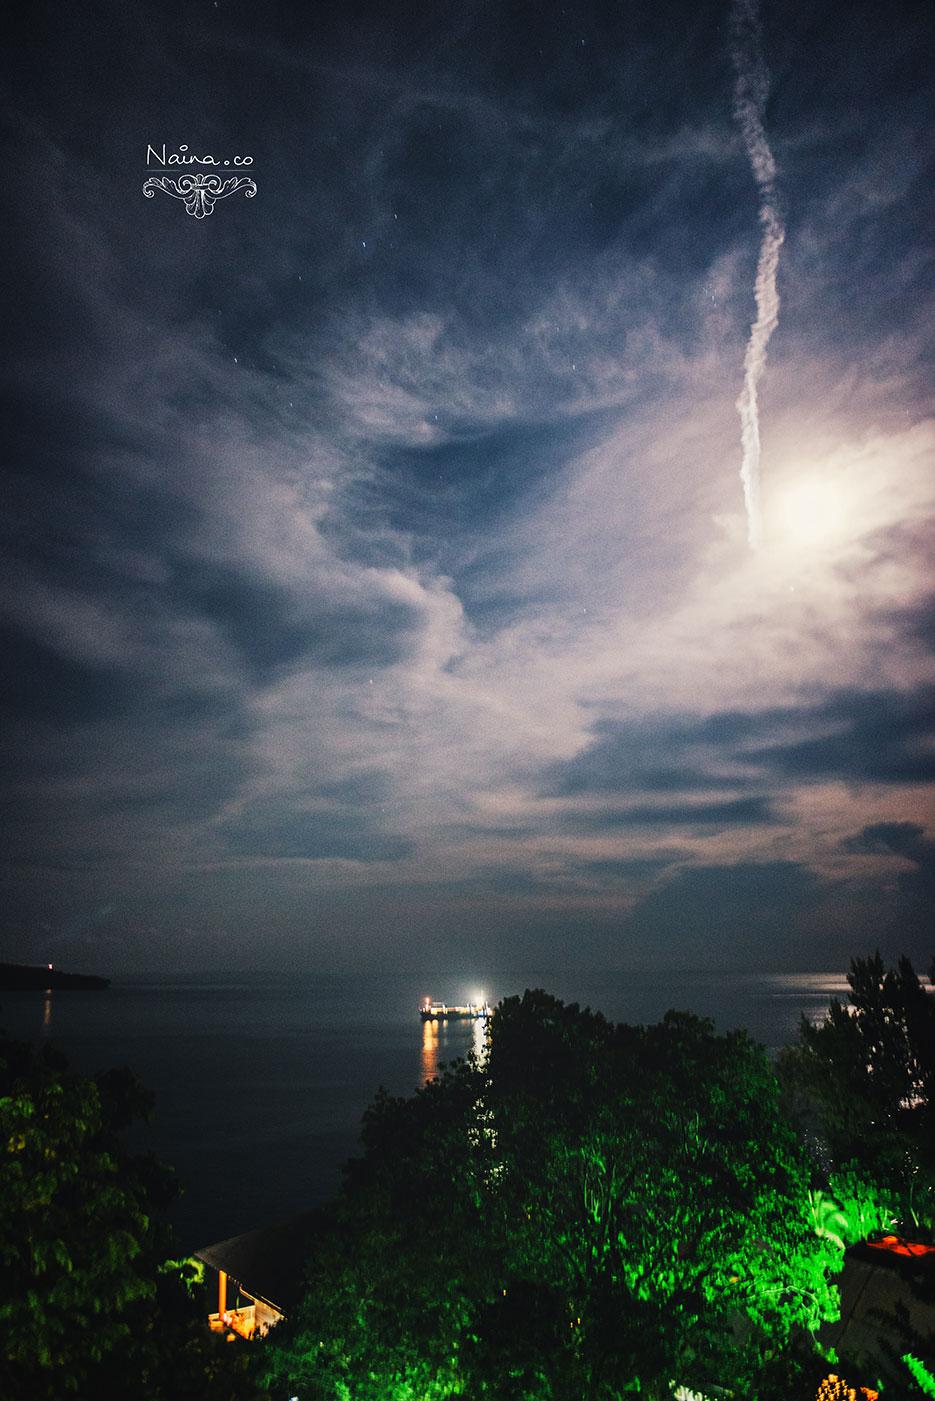 Andaman Islands, Havelock, Barefoot Resort vacation and travel photography as captured by photographer Naina Redhu.